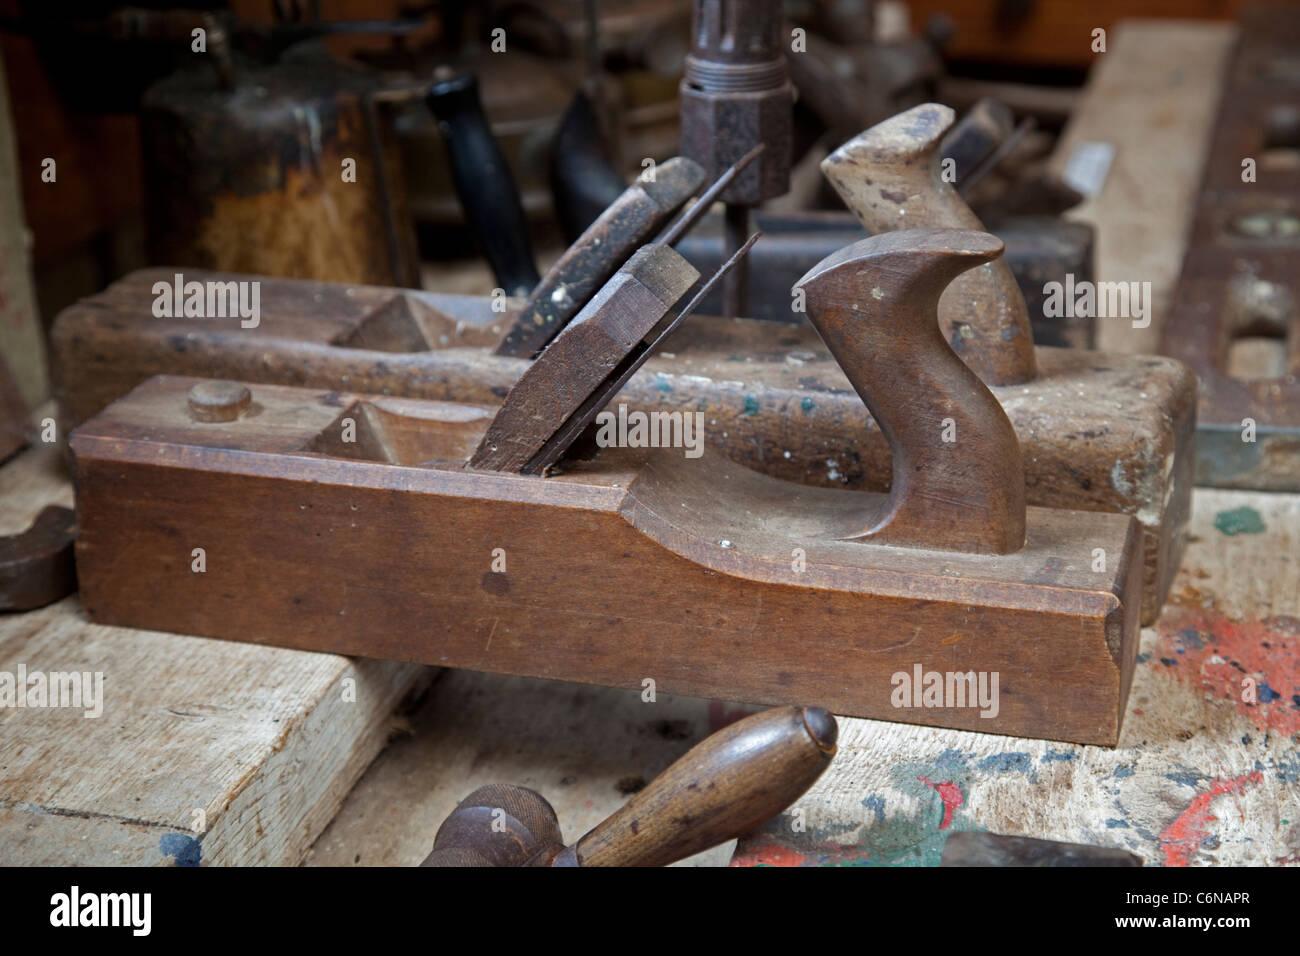 Old wooden carpentry plane Wayside Museum Zennor Cornwall UK - Stock Image